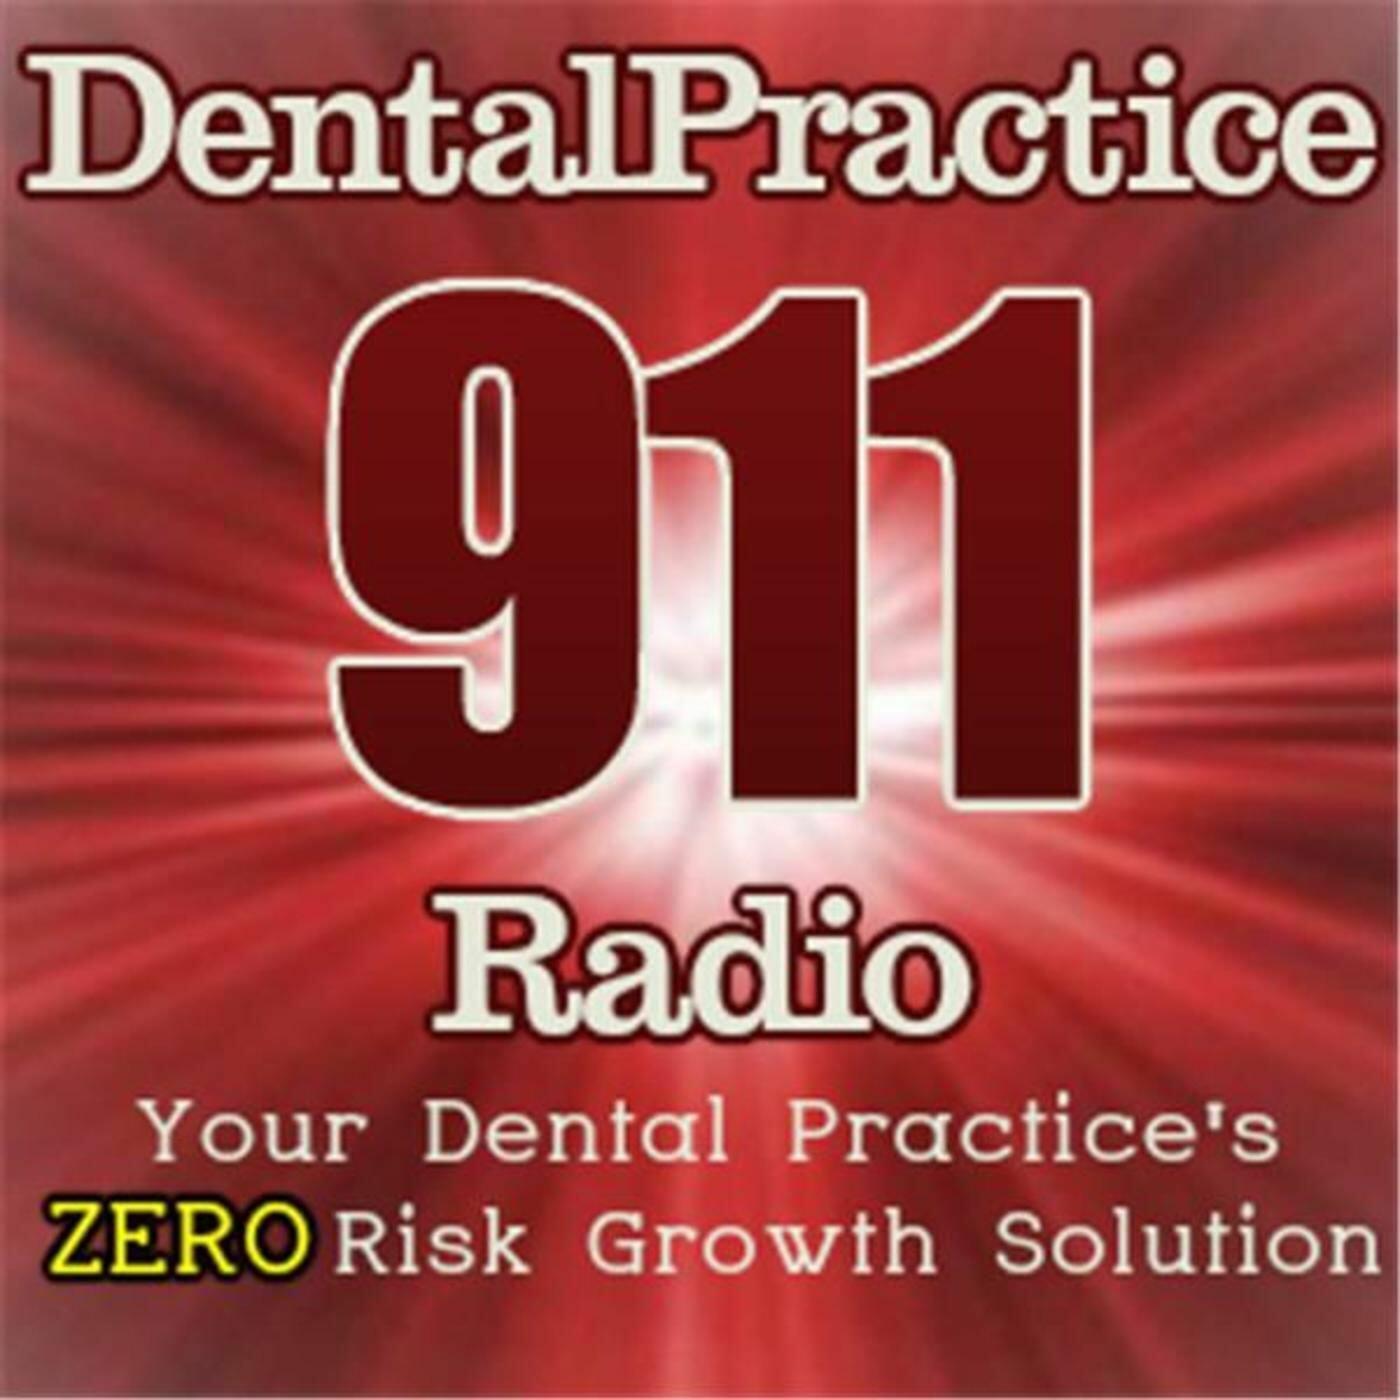 Dental Practice 911 Radio